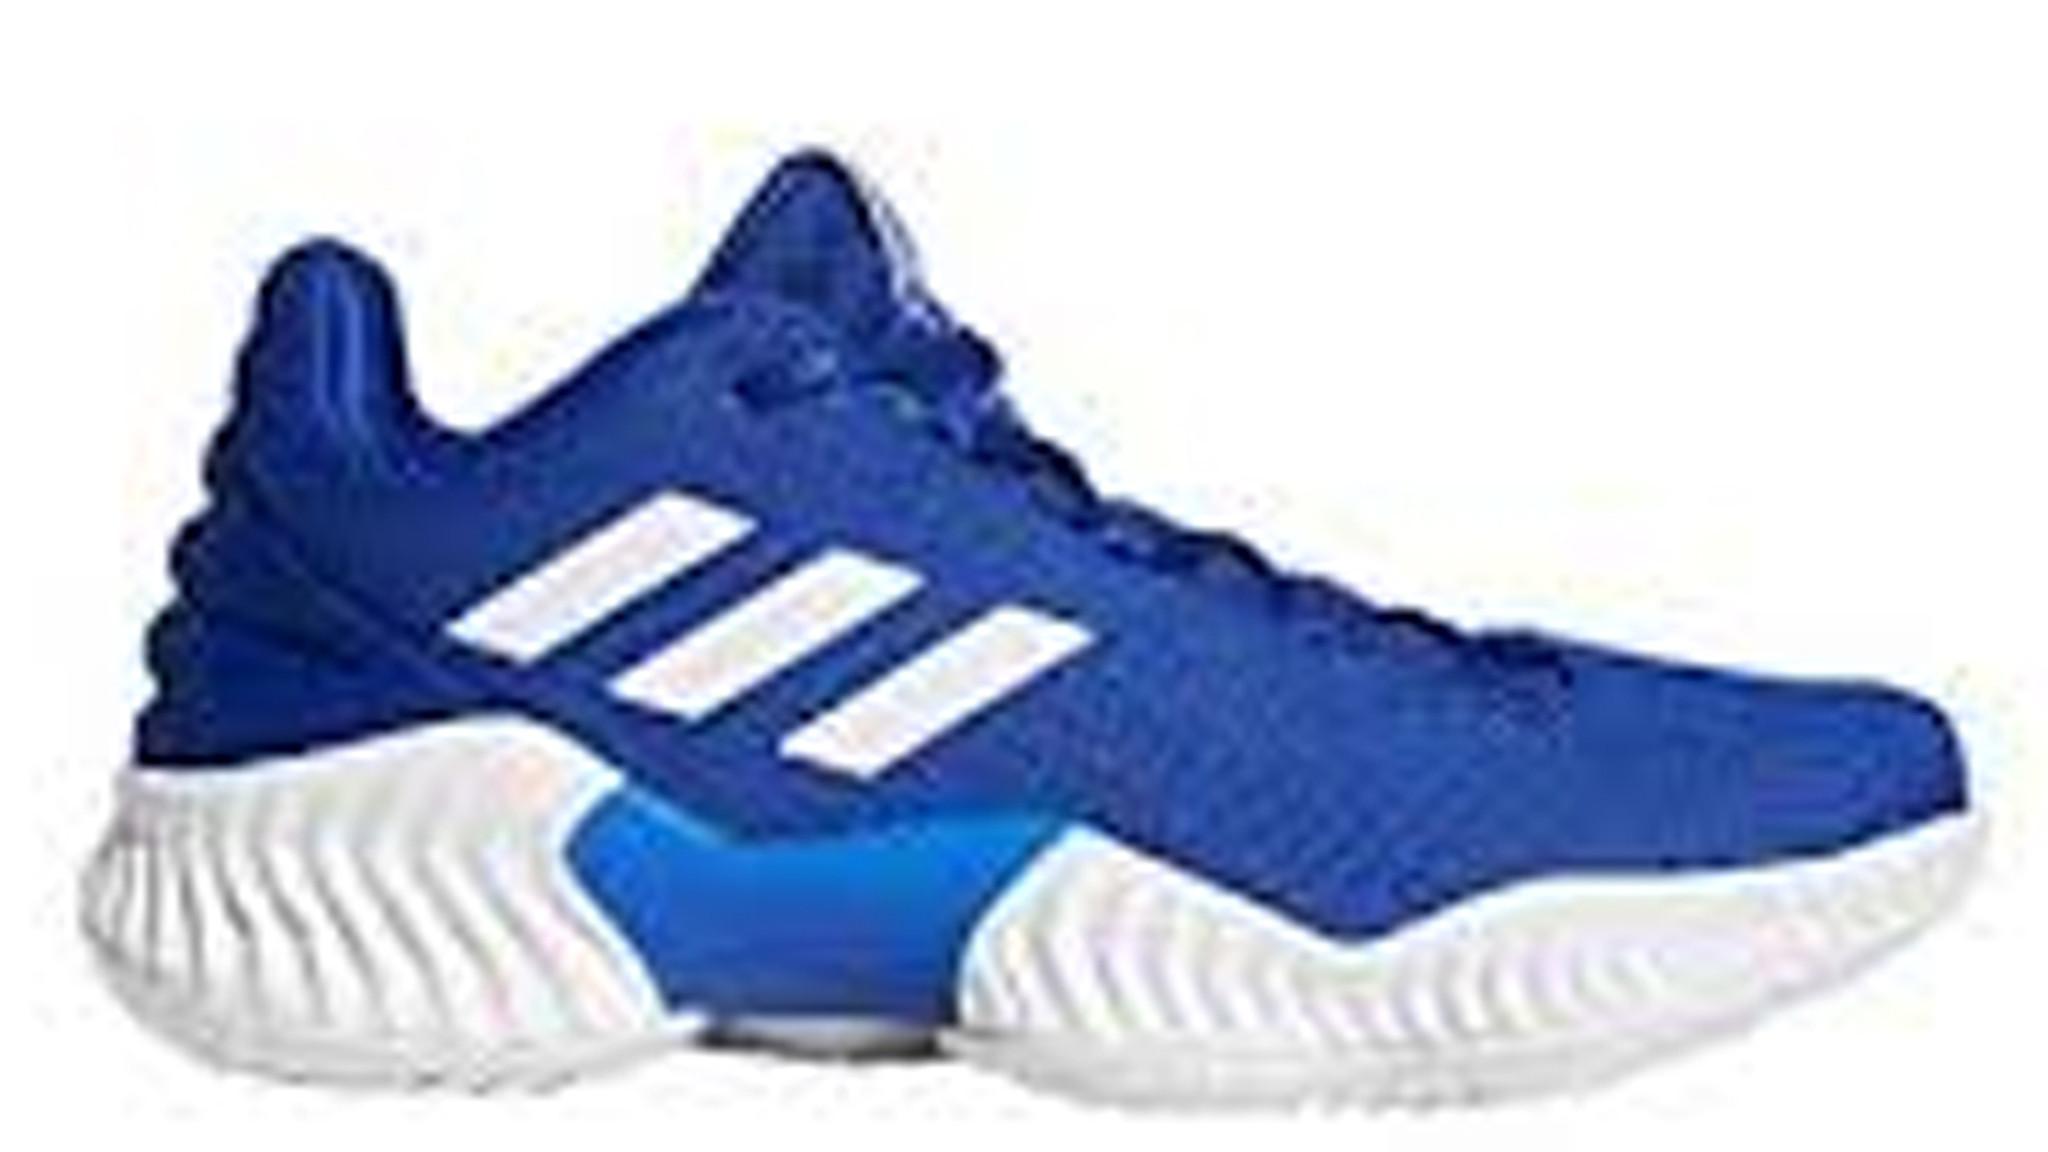 5640b94a2c Adidas Pro Bounce Low AH2678